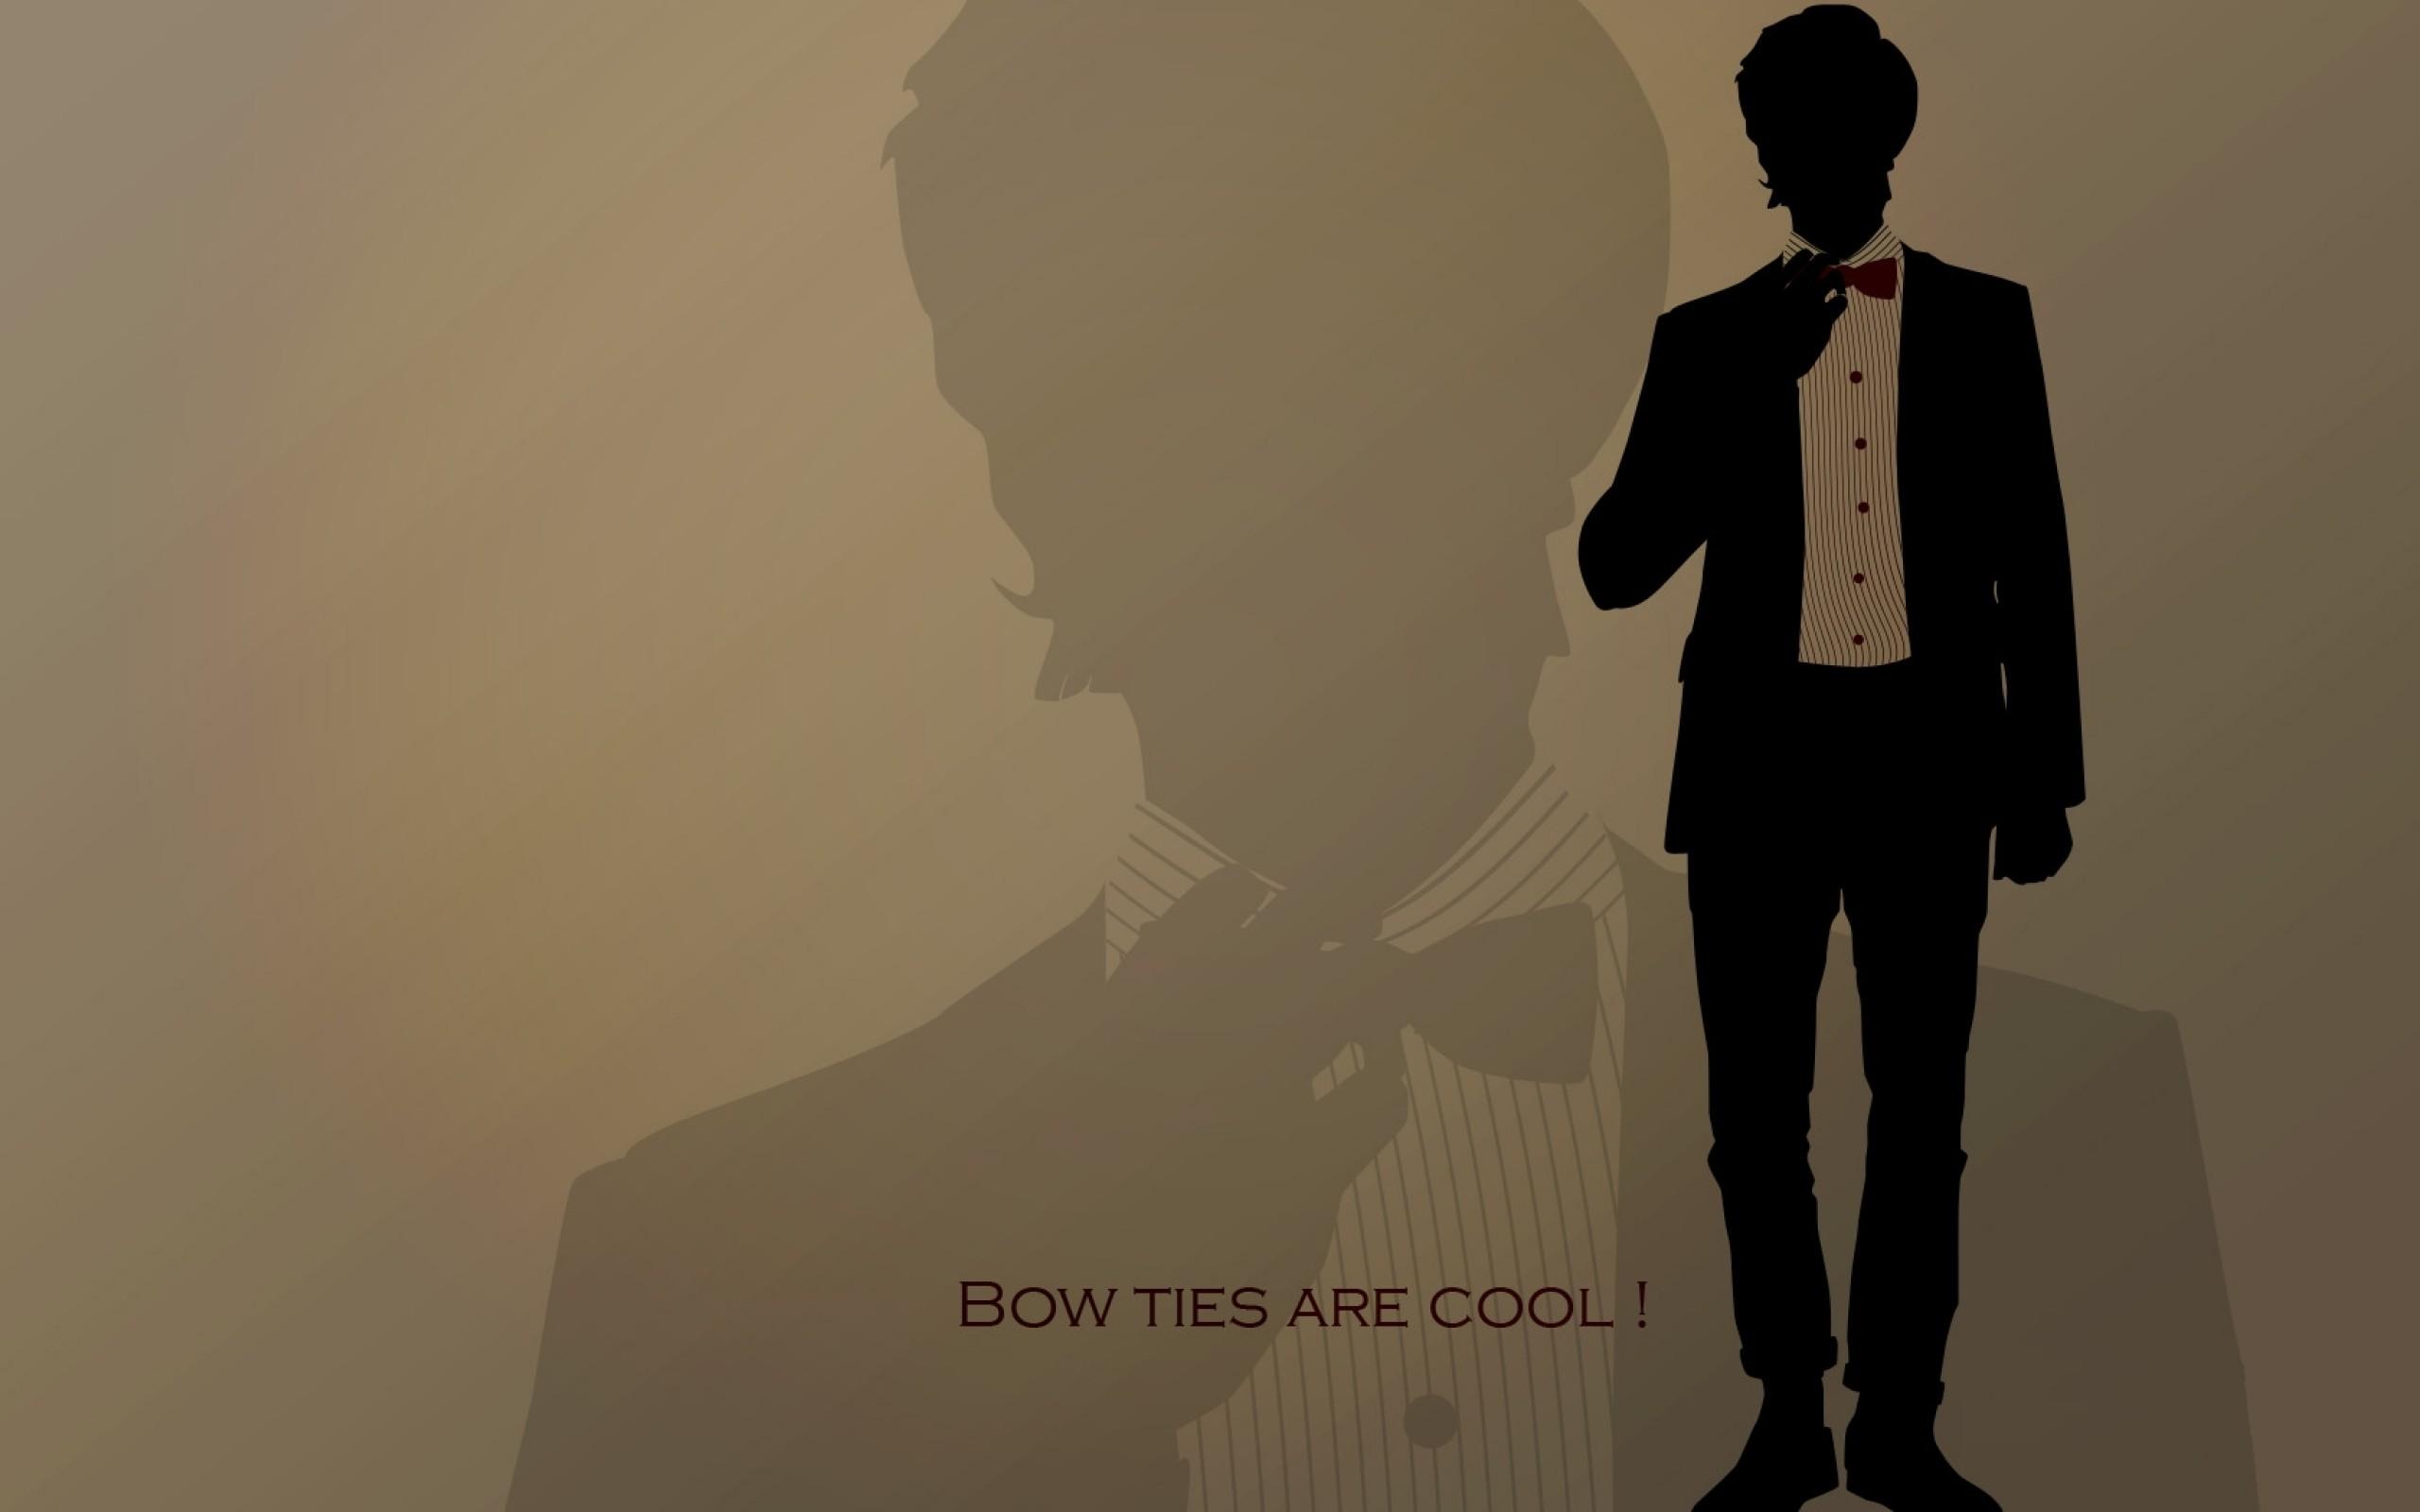 2560x1600 Eleventh Doctor Who Bowtie 1680x1050 Wallpaper Art HD